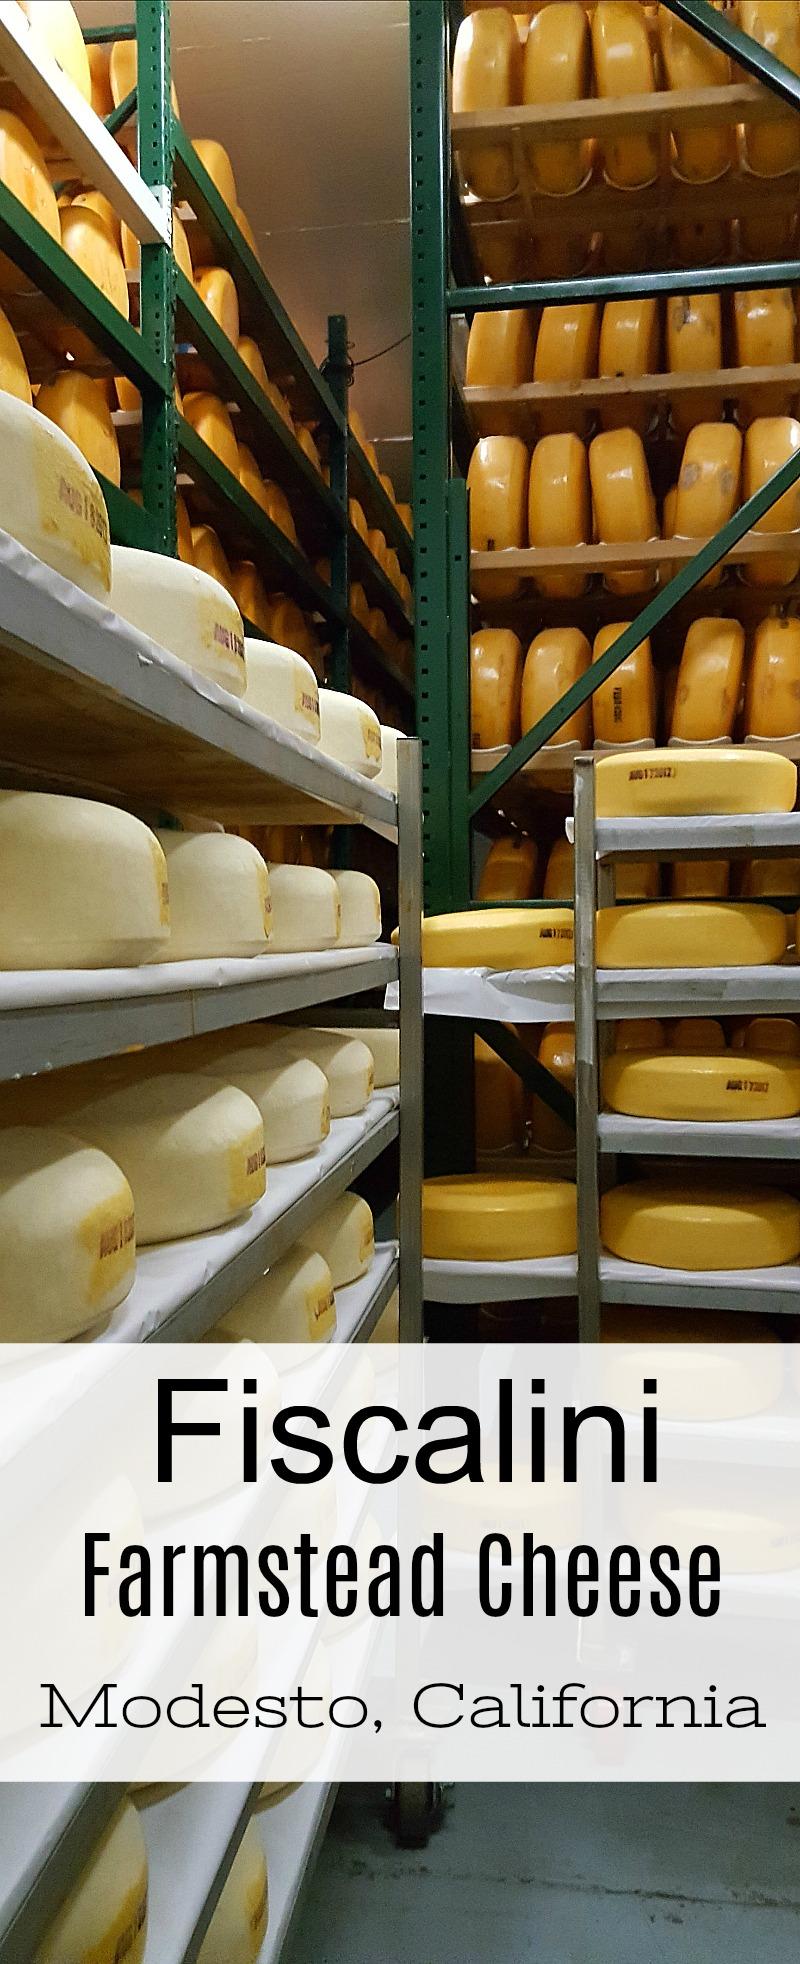 Fiscalini Cheese and Dairy Farm Tour in Modesto, California